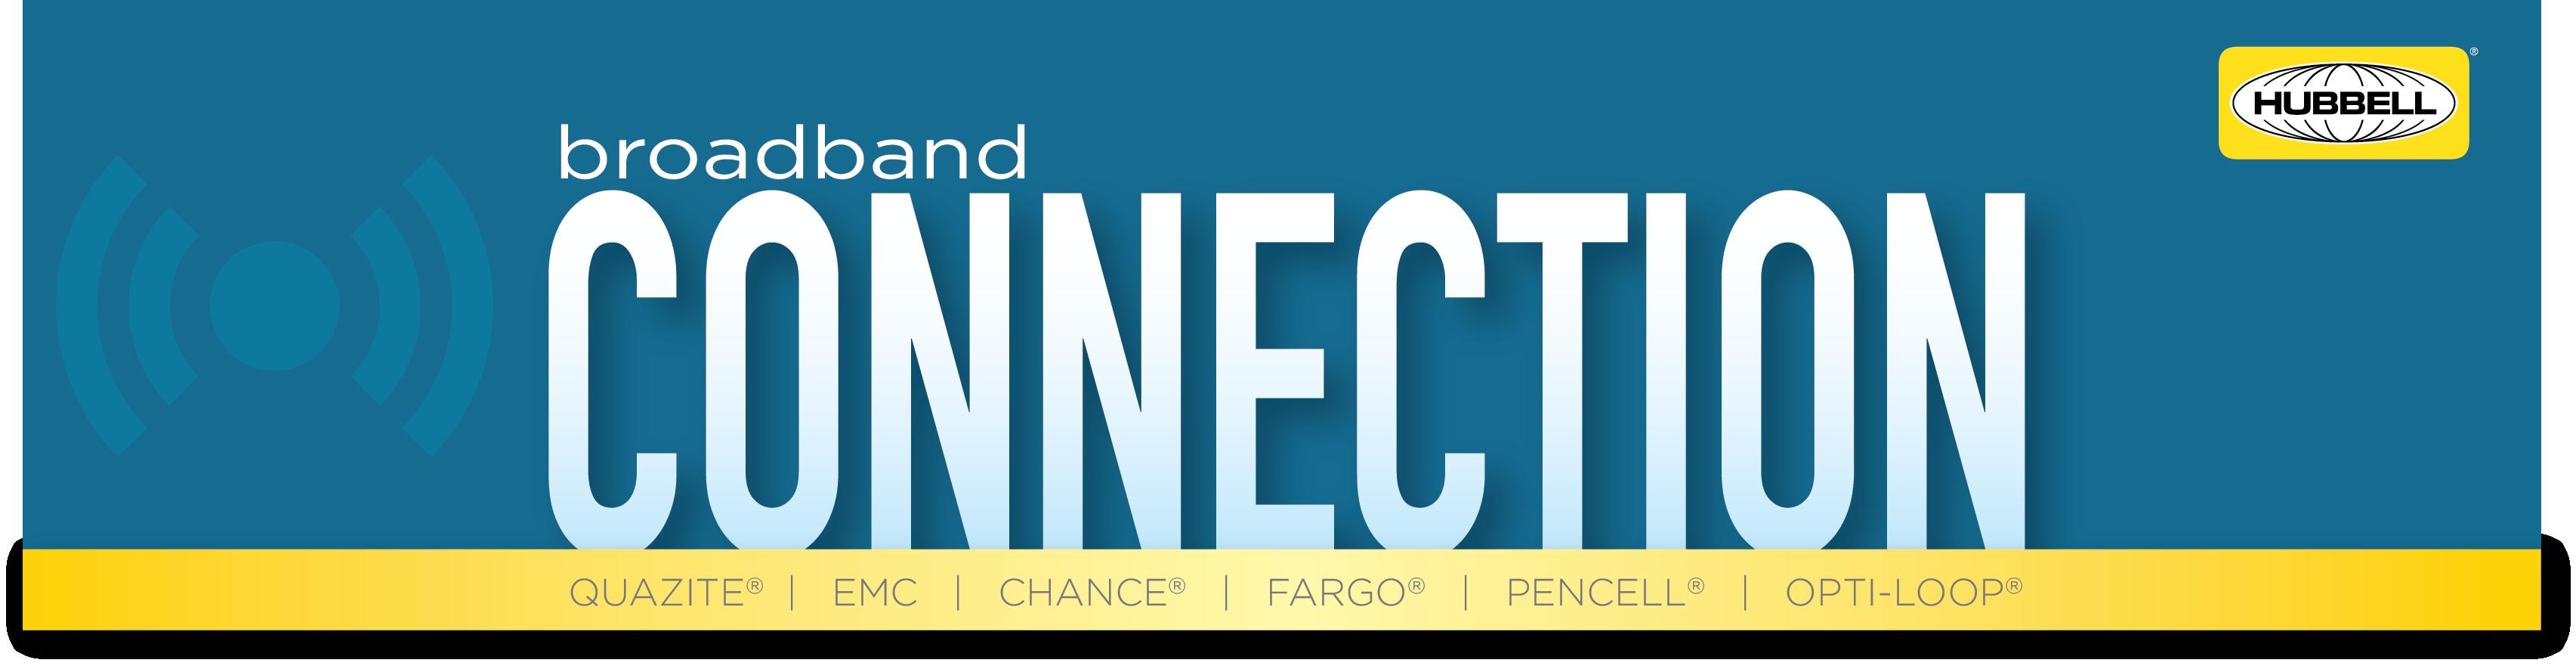 BroadbandConnection_Header3.png